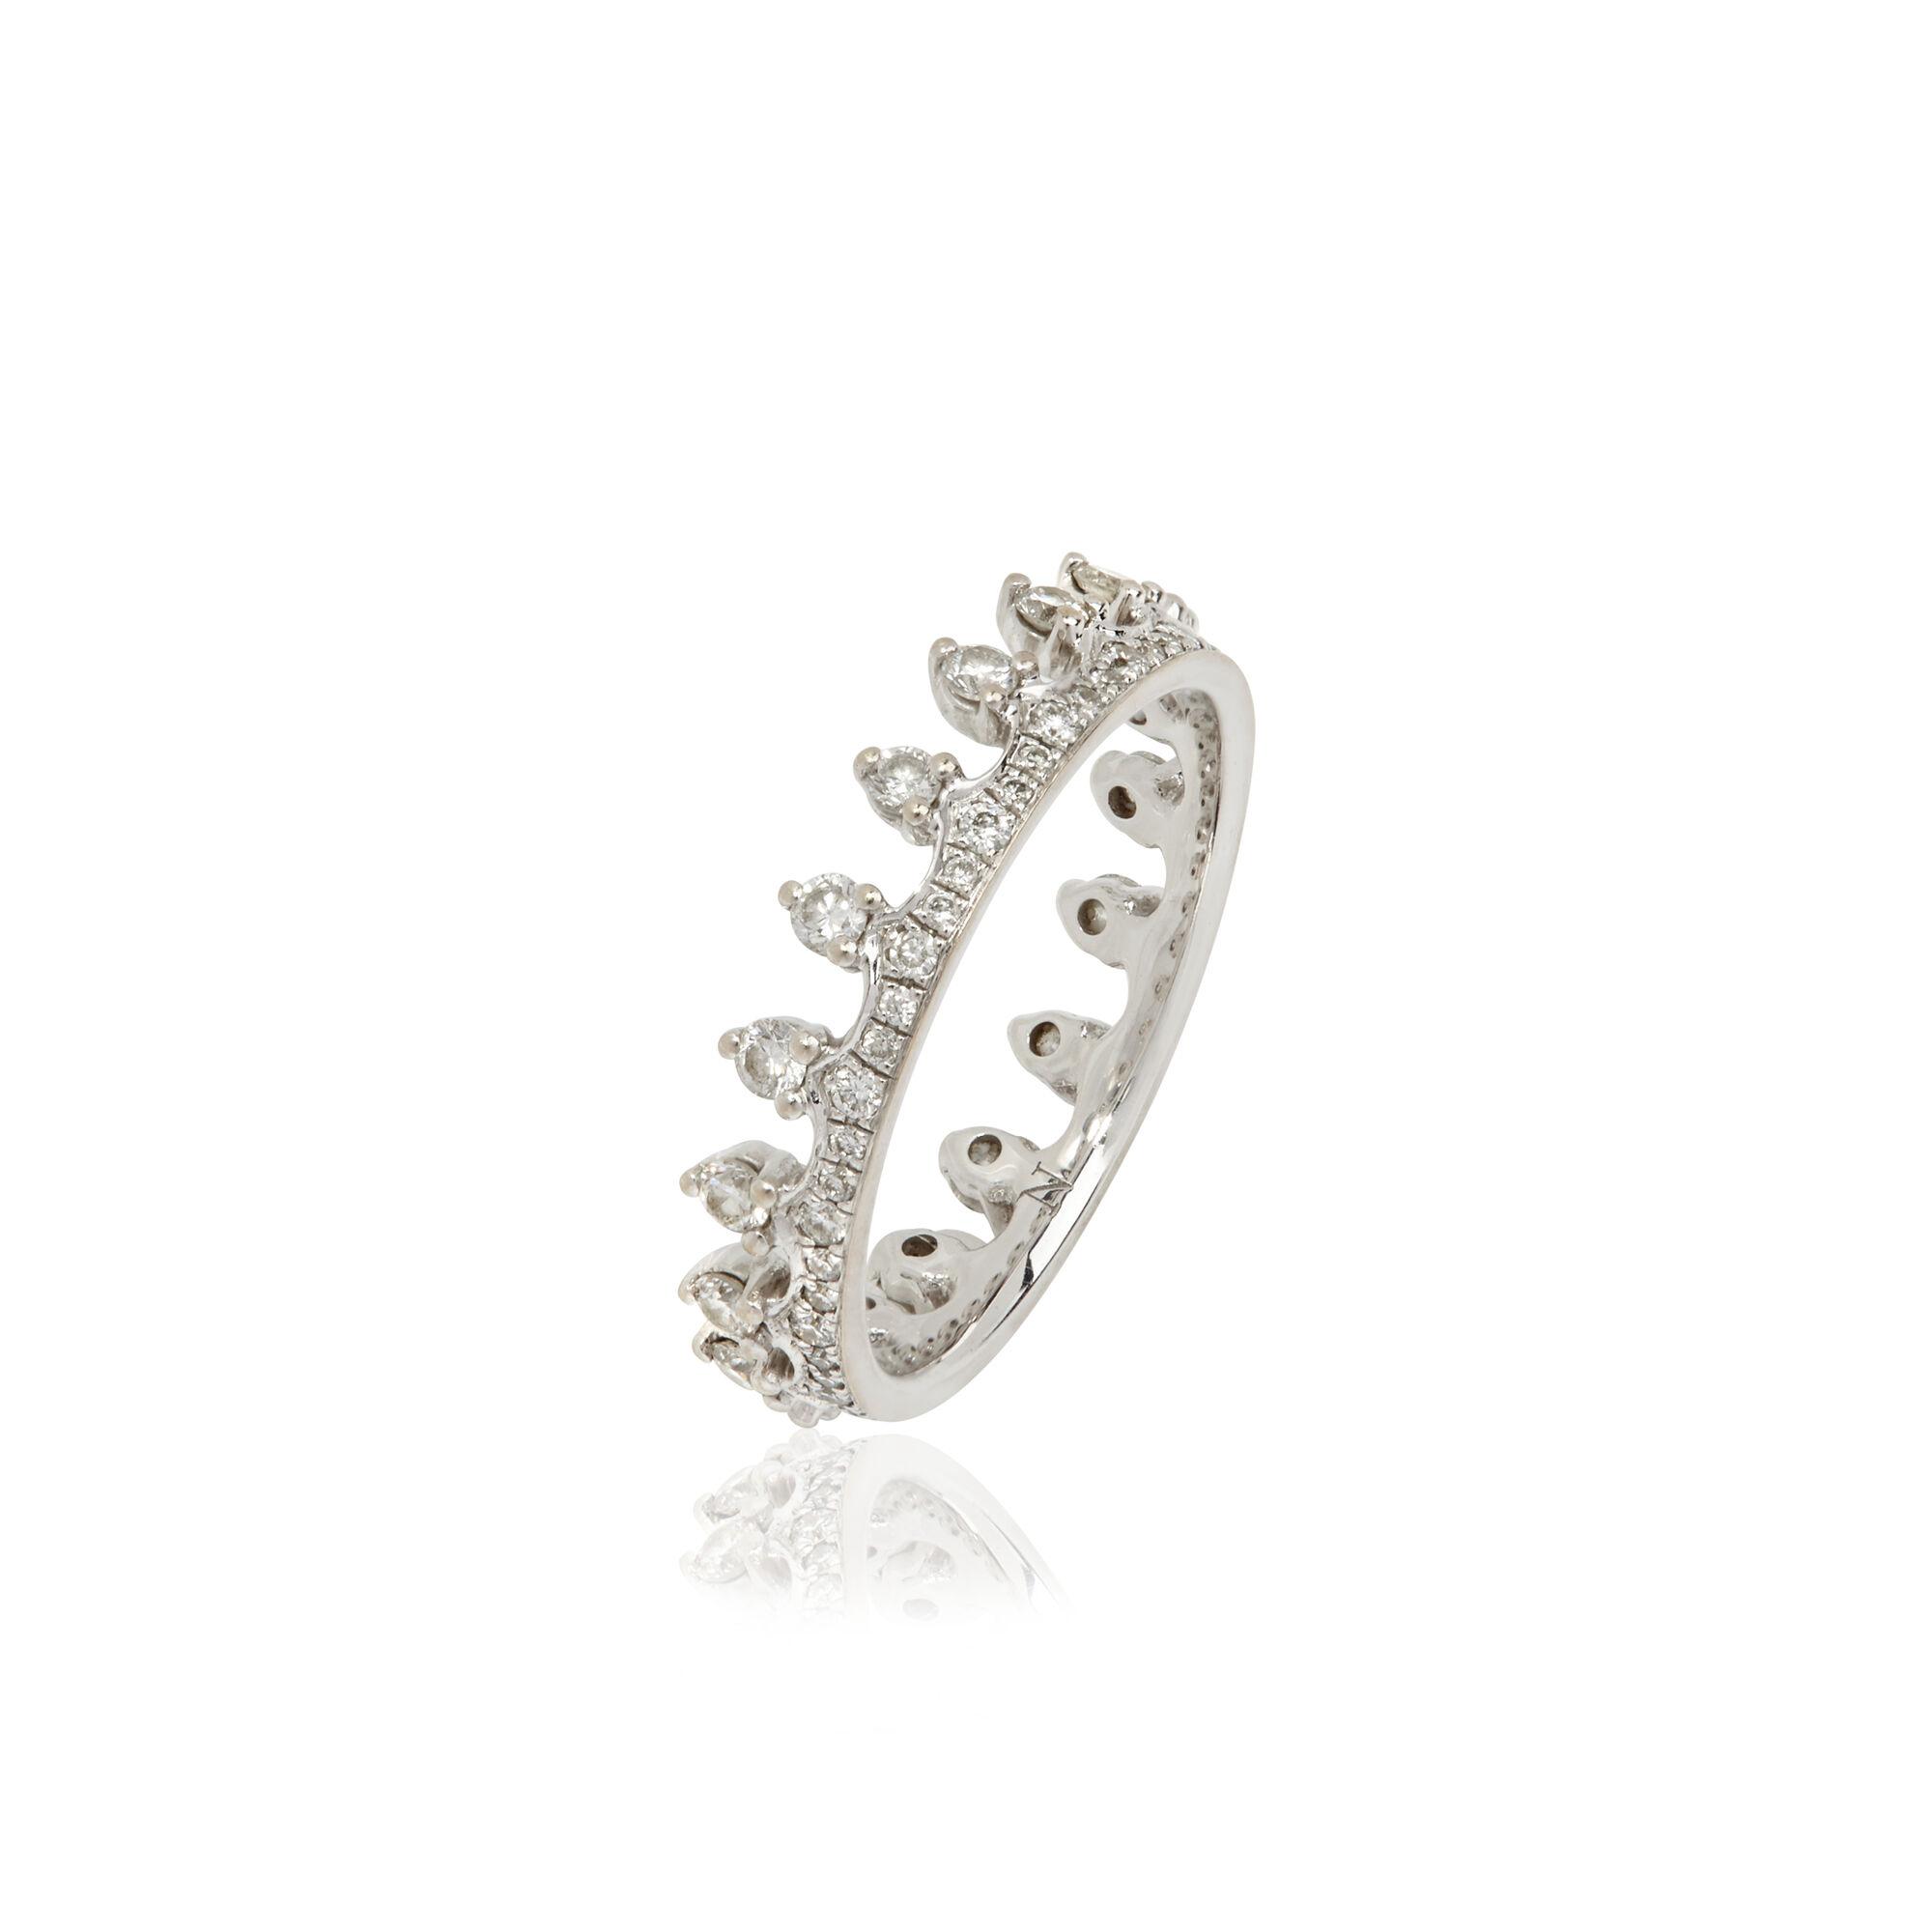 Crown 18ct White Gold Diamond Ring Annoushka Us